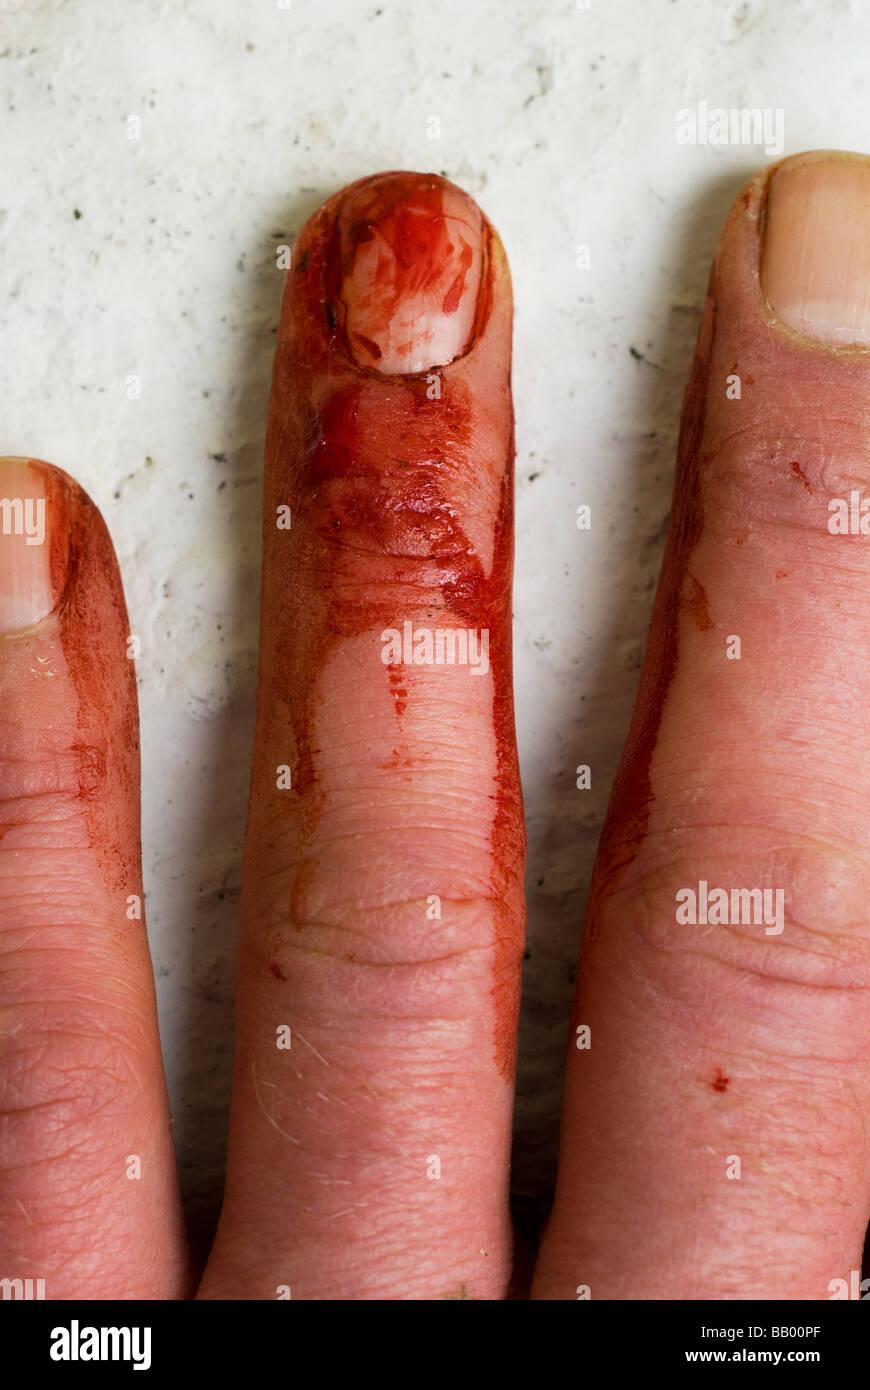 photograph of bleeding finger cut injury - Stock Image